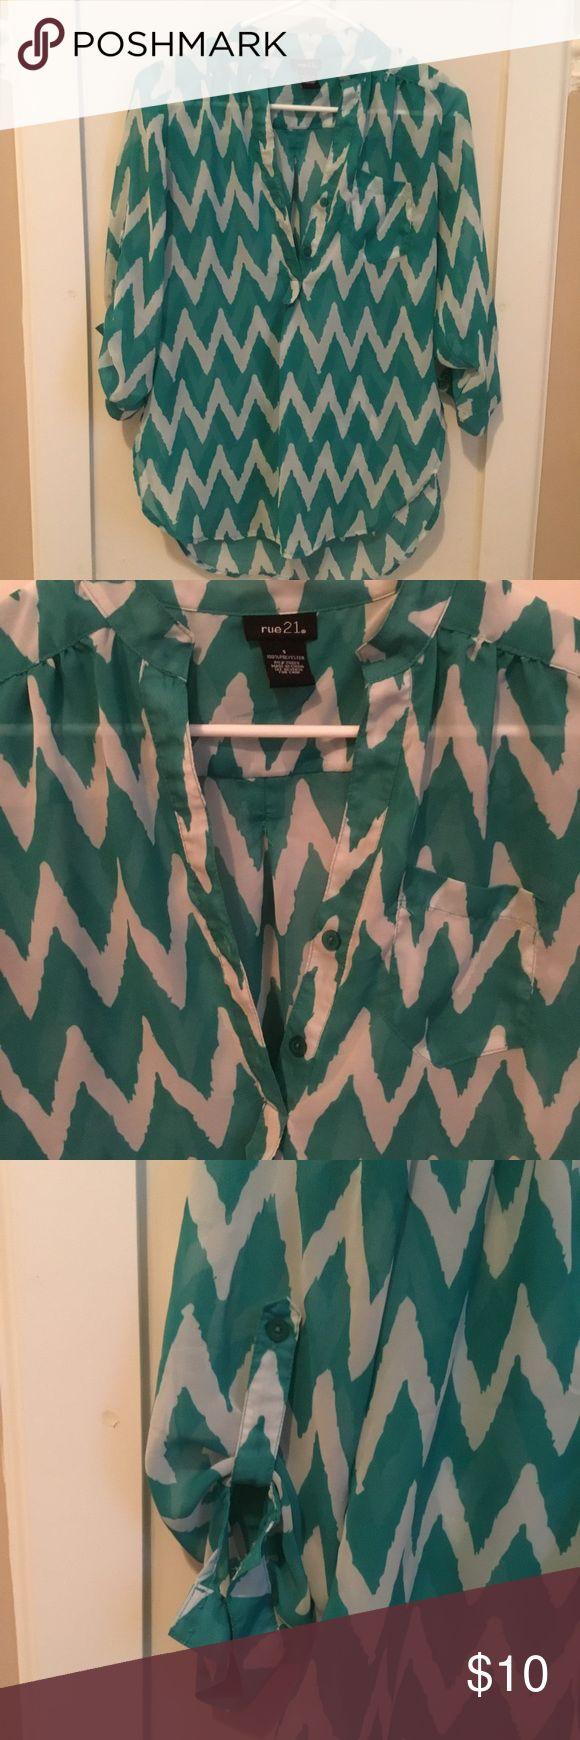 Chevron blouse Shear summer shirt Rue21 Tops Blouses